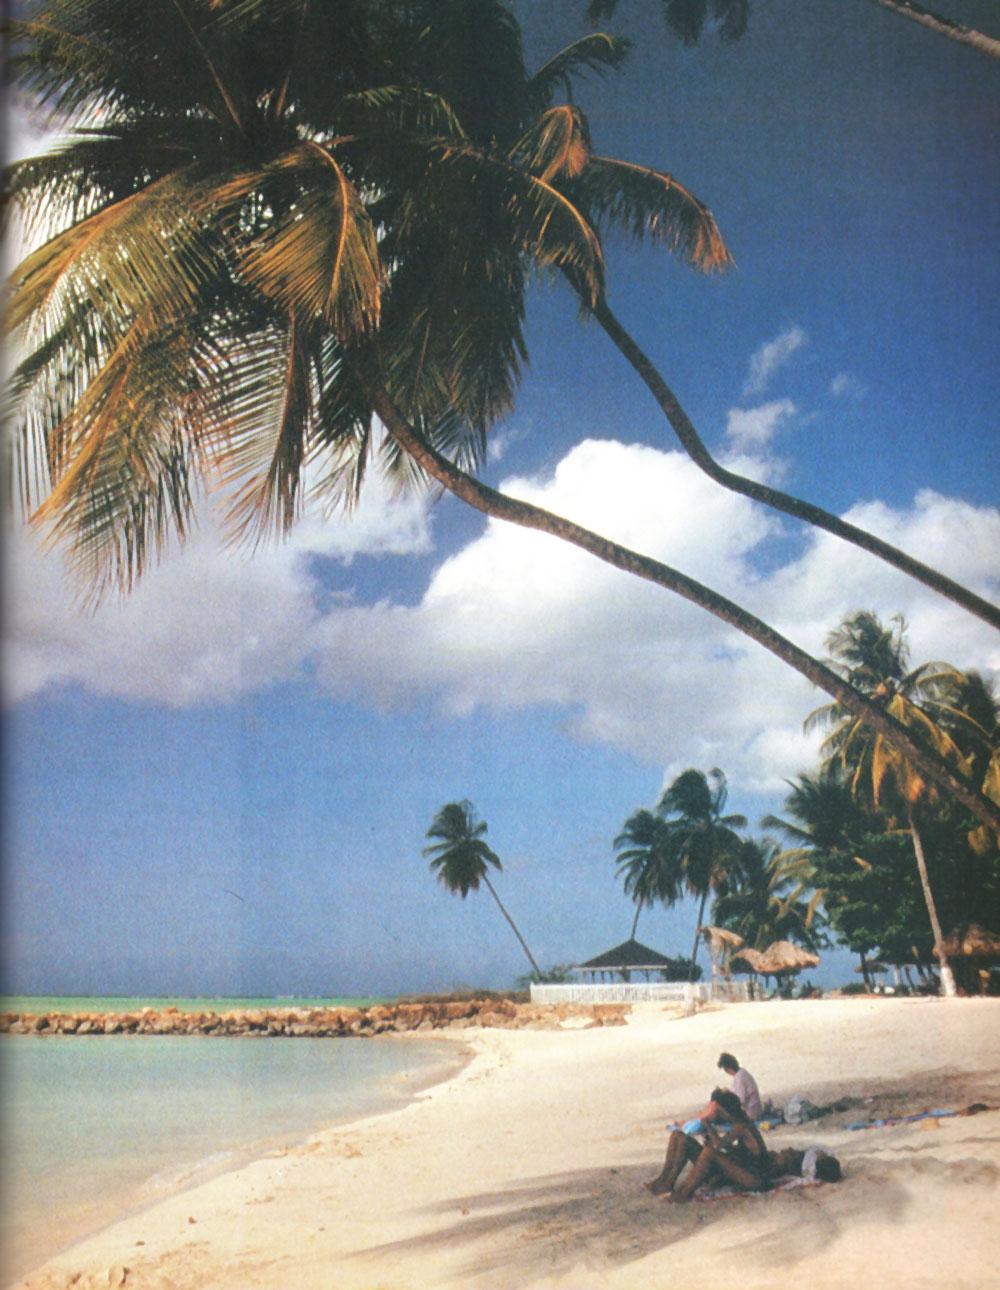 Tranquil Tobago. Photograph by Allan Weisbecker